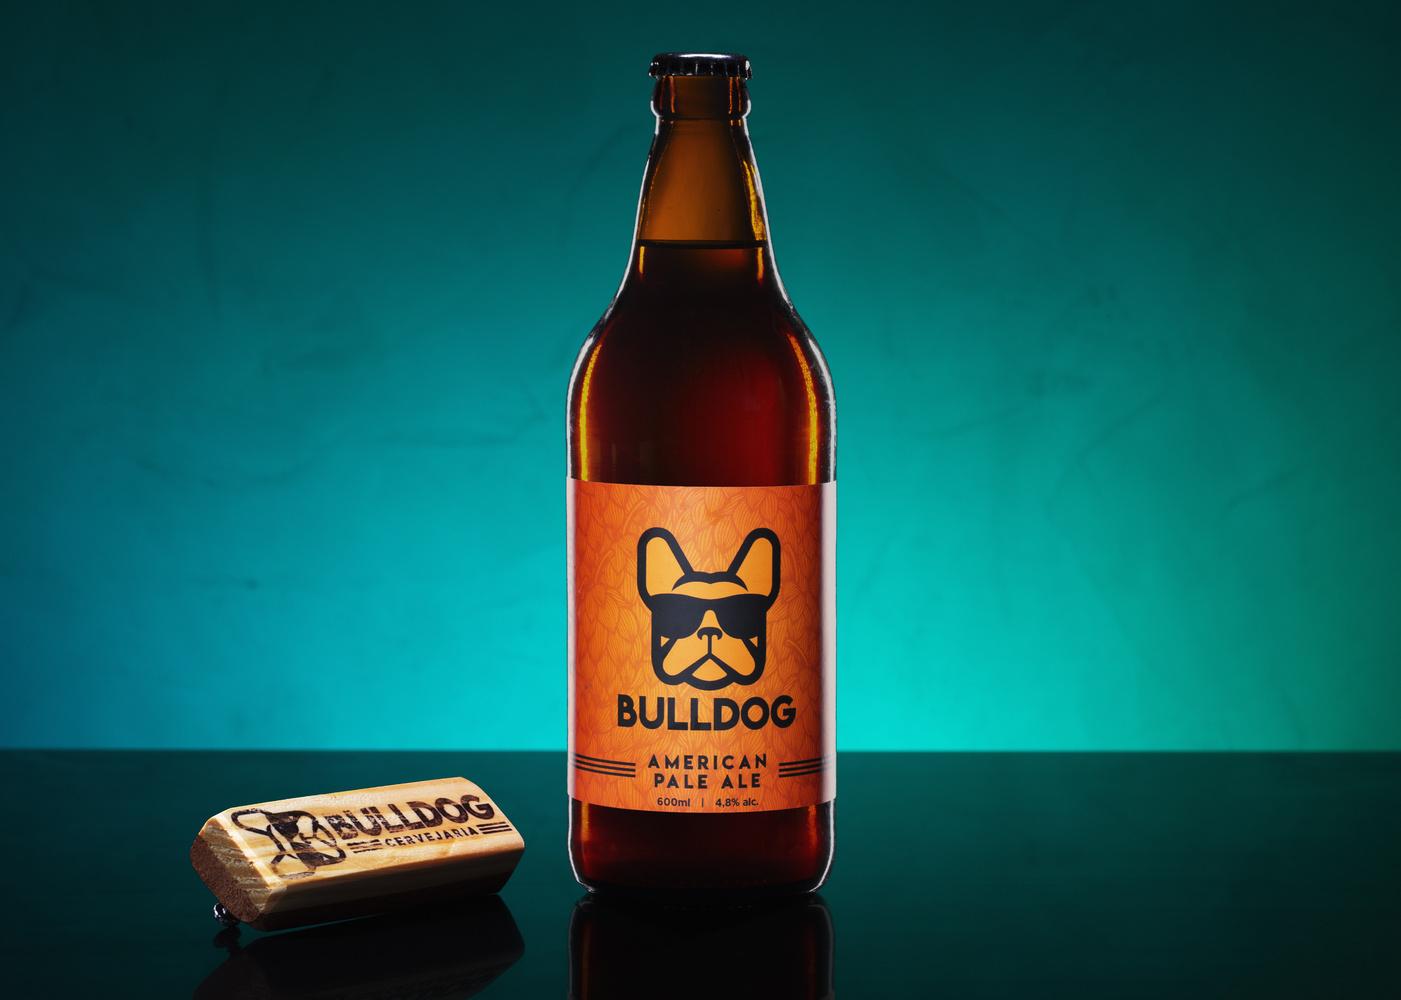 Bulldog American Pale Ale by Gabriel Ferrão da Cunha